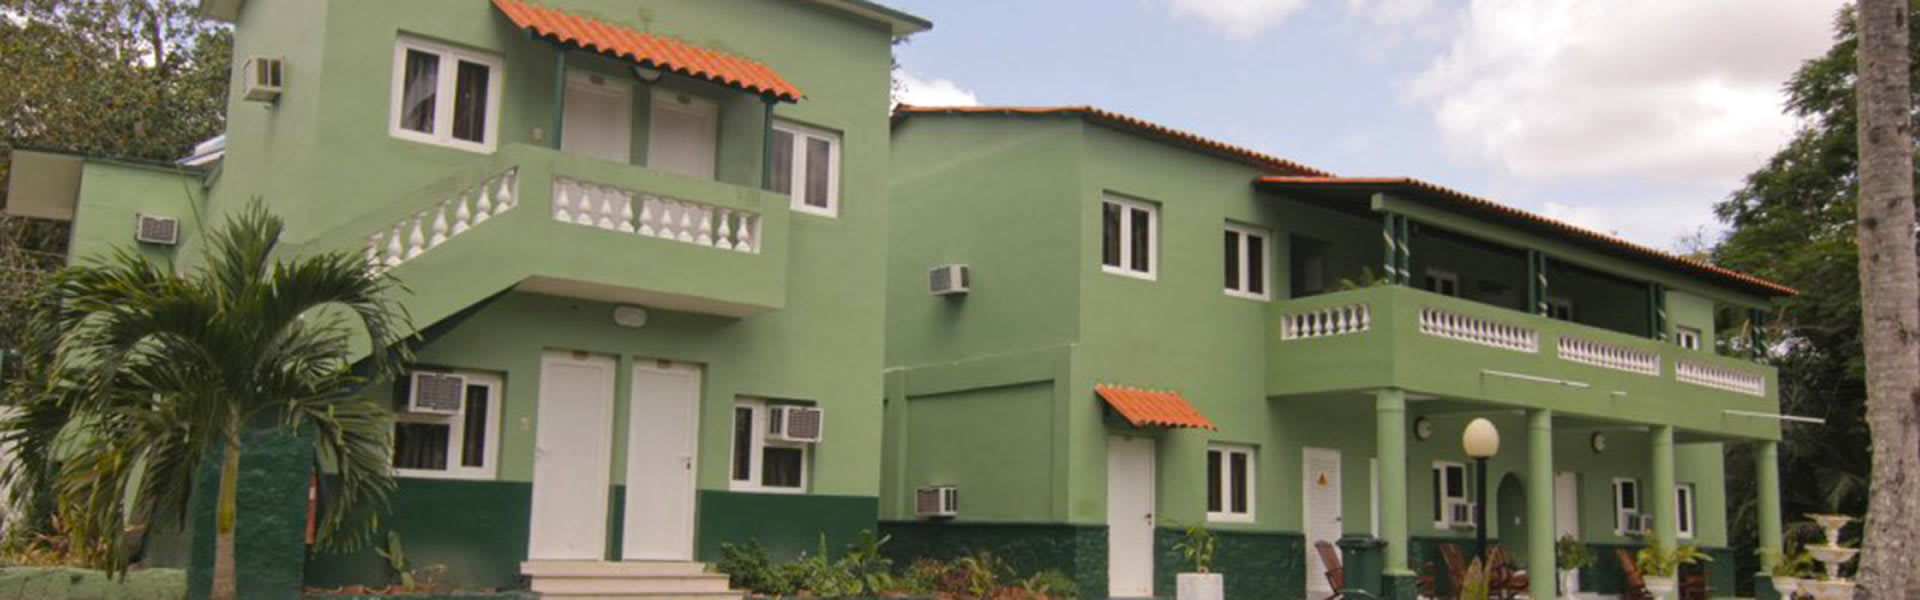 Villa san jose del lago sancti spiritus for Hotel villa del lago